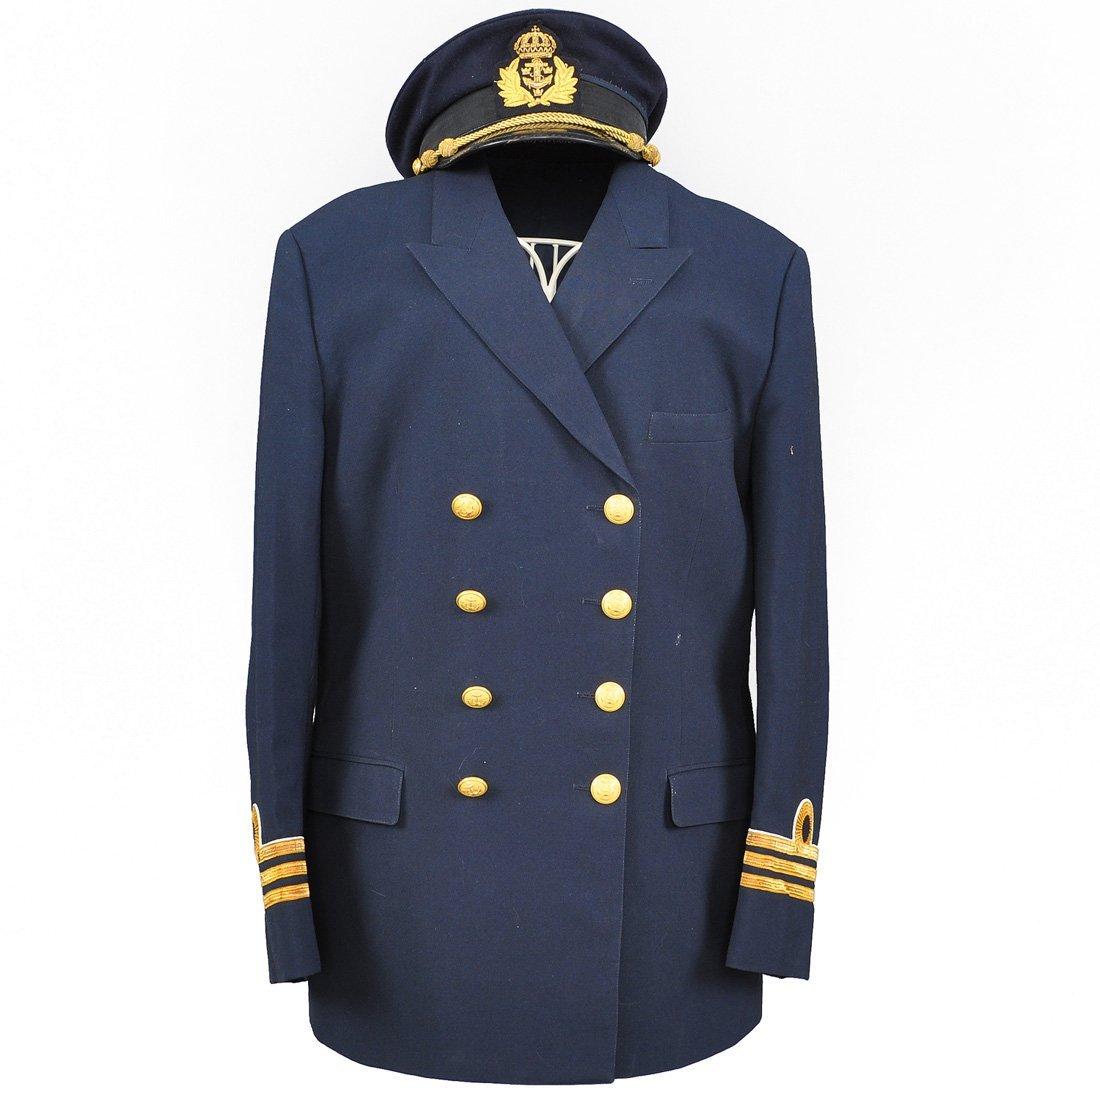 7: UNIFORM, kapten, Sverige